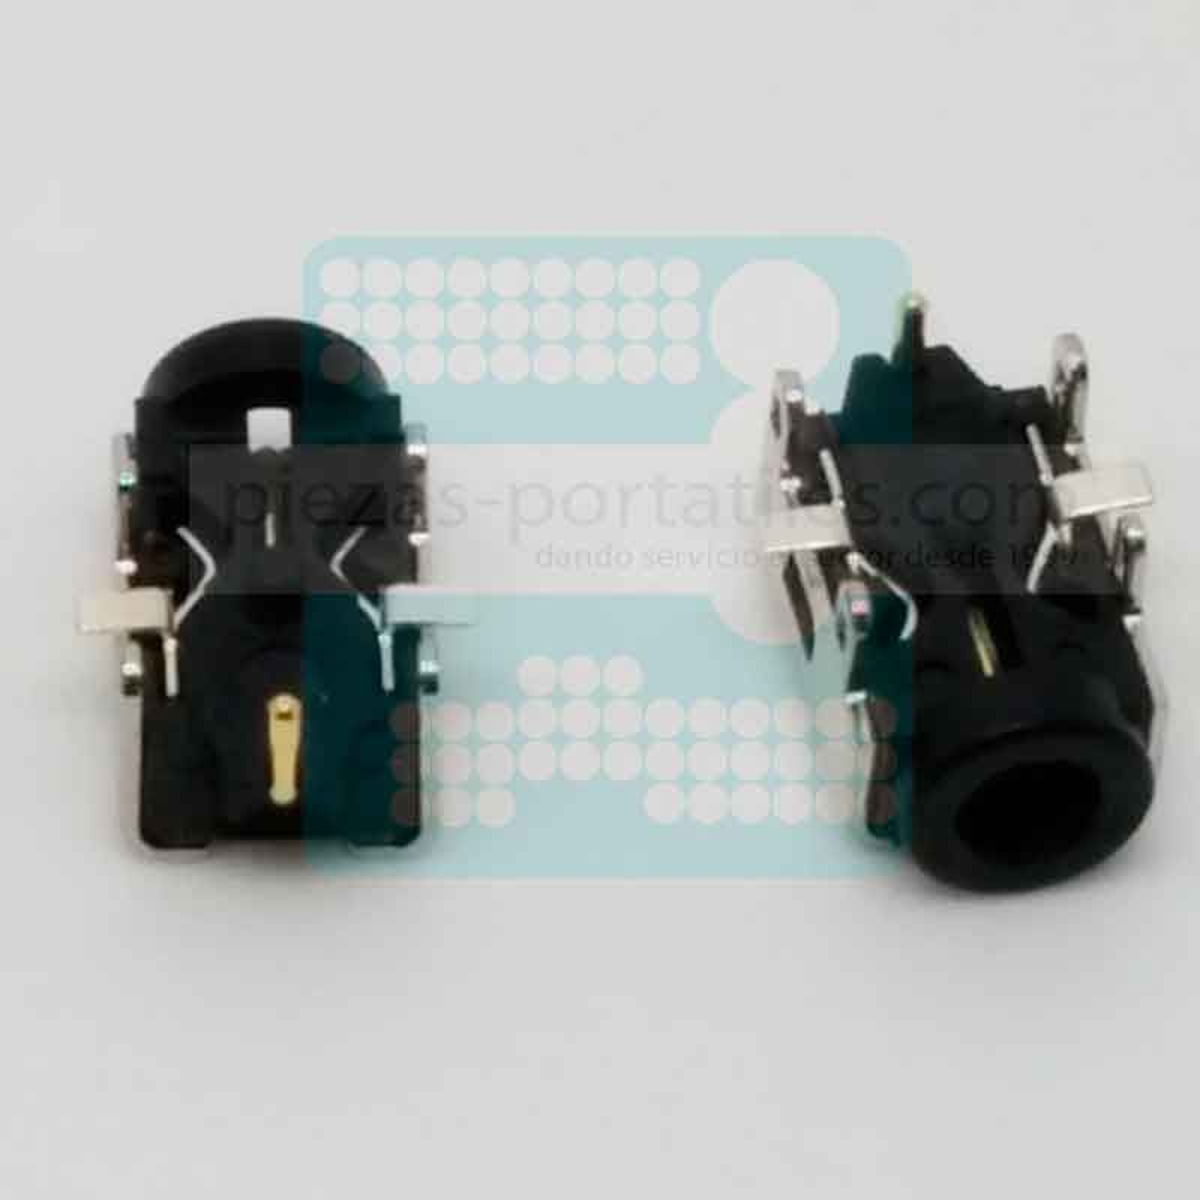 6Pcs Amarillo Scotch Lock Quick Splice Wire Conector Senven/® 50Pcs Scotch Lock Empalme R/ápido 22Pcs Azul 22Pcs Rojo Conector Cable Bloqueo Scotch Terminal de Cable Rapida Splice Conector